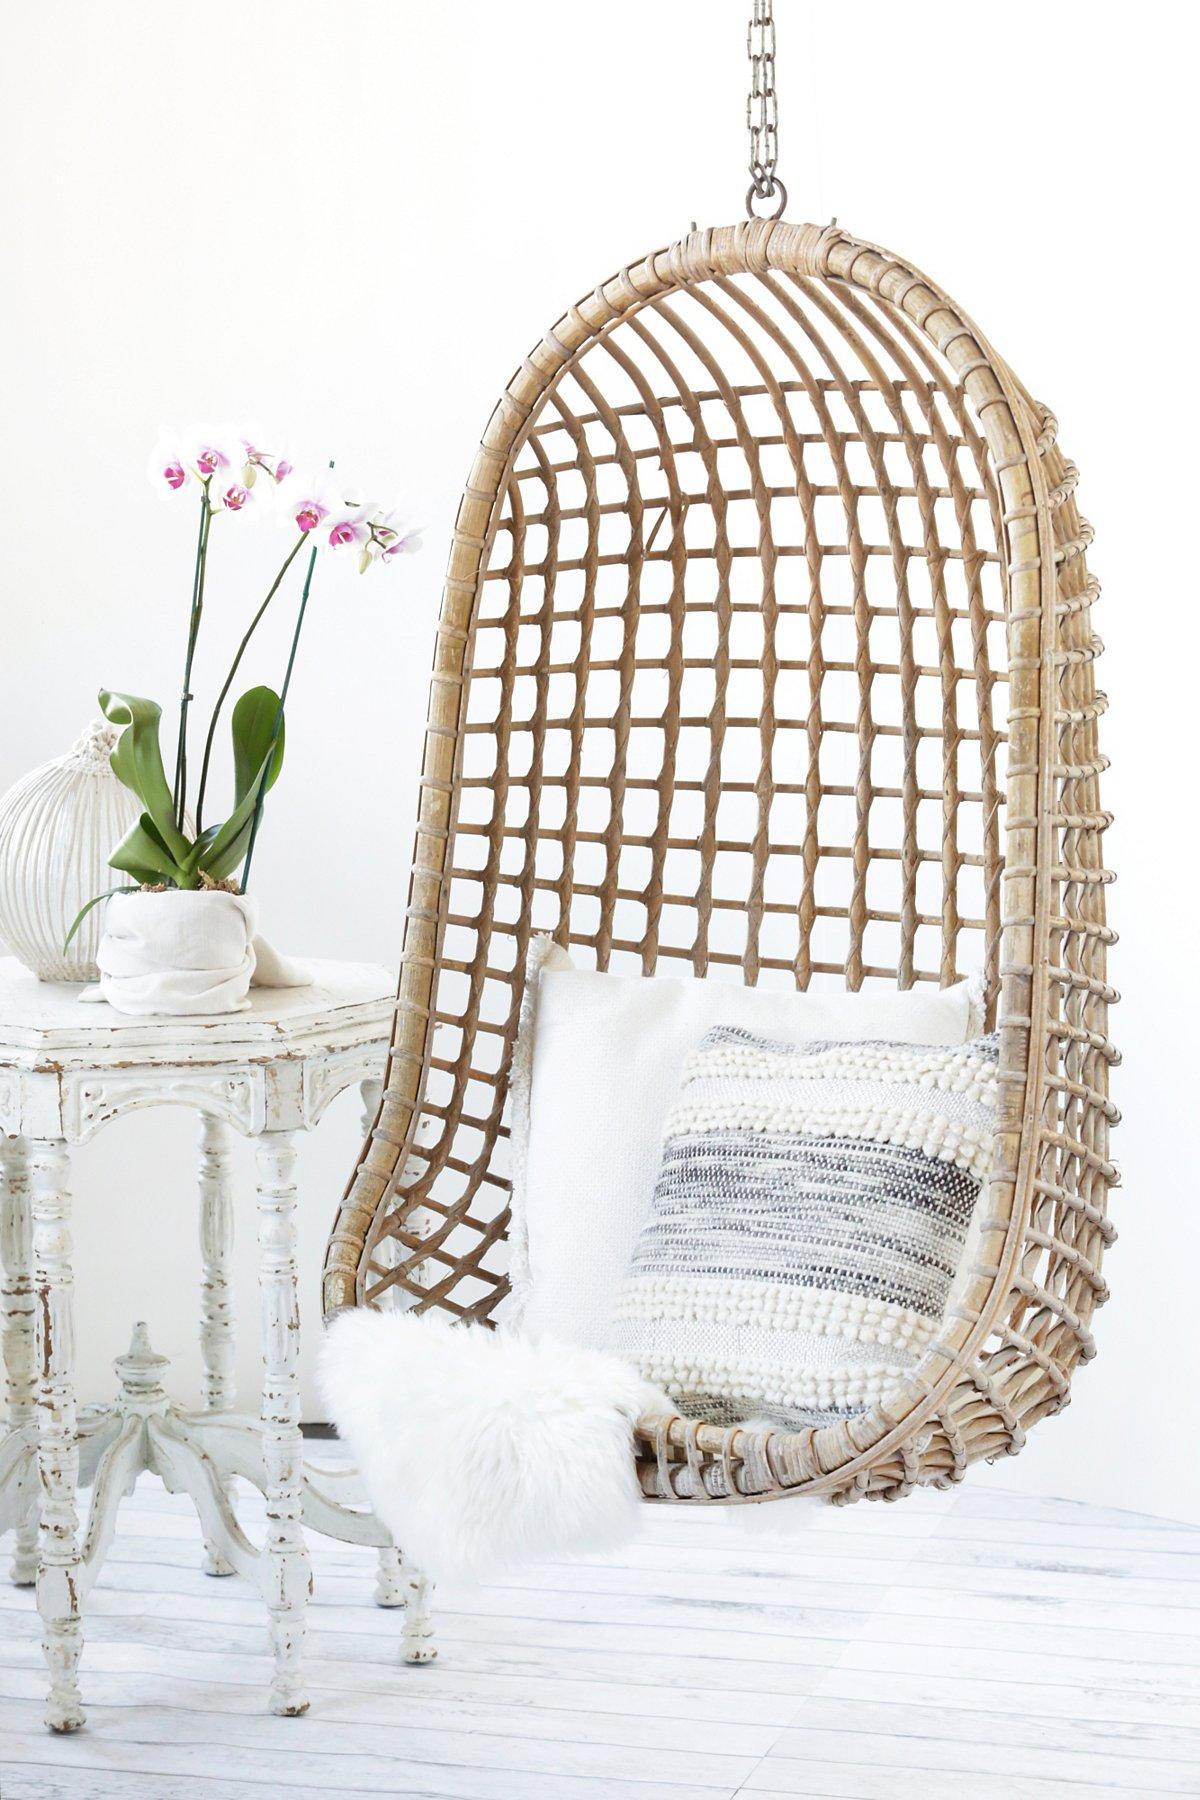 Vintage Rattan Hang Chair - SOLD